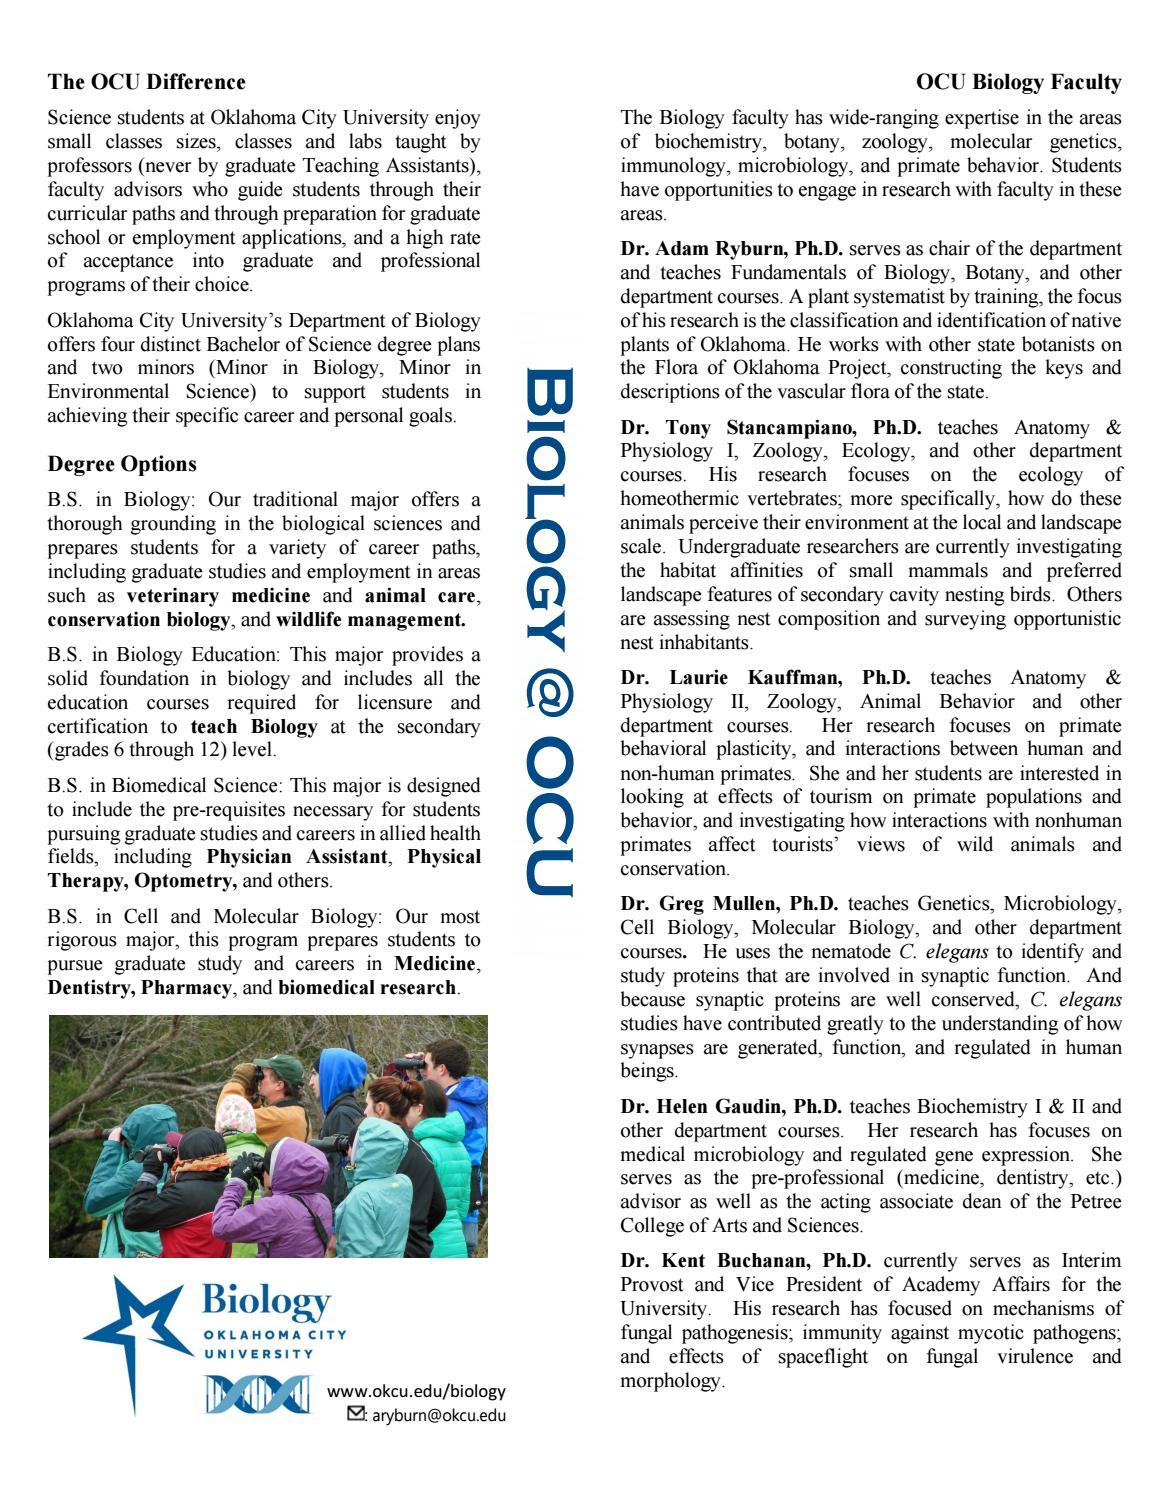 Biology at ocu by oklahoma city university issuu xflitez Gallery